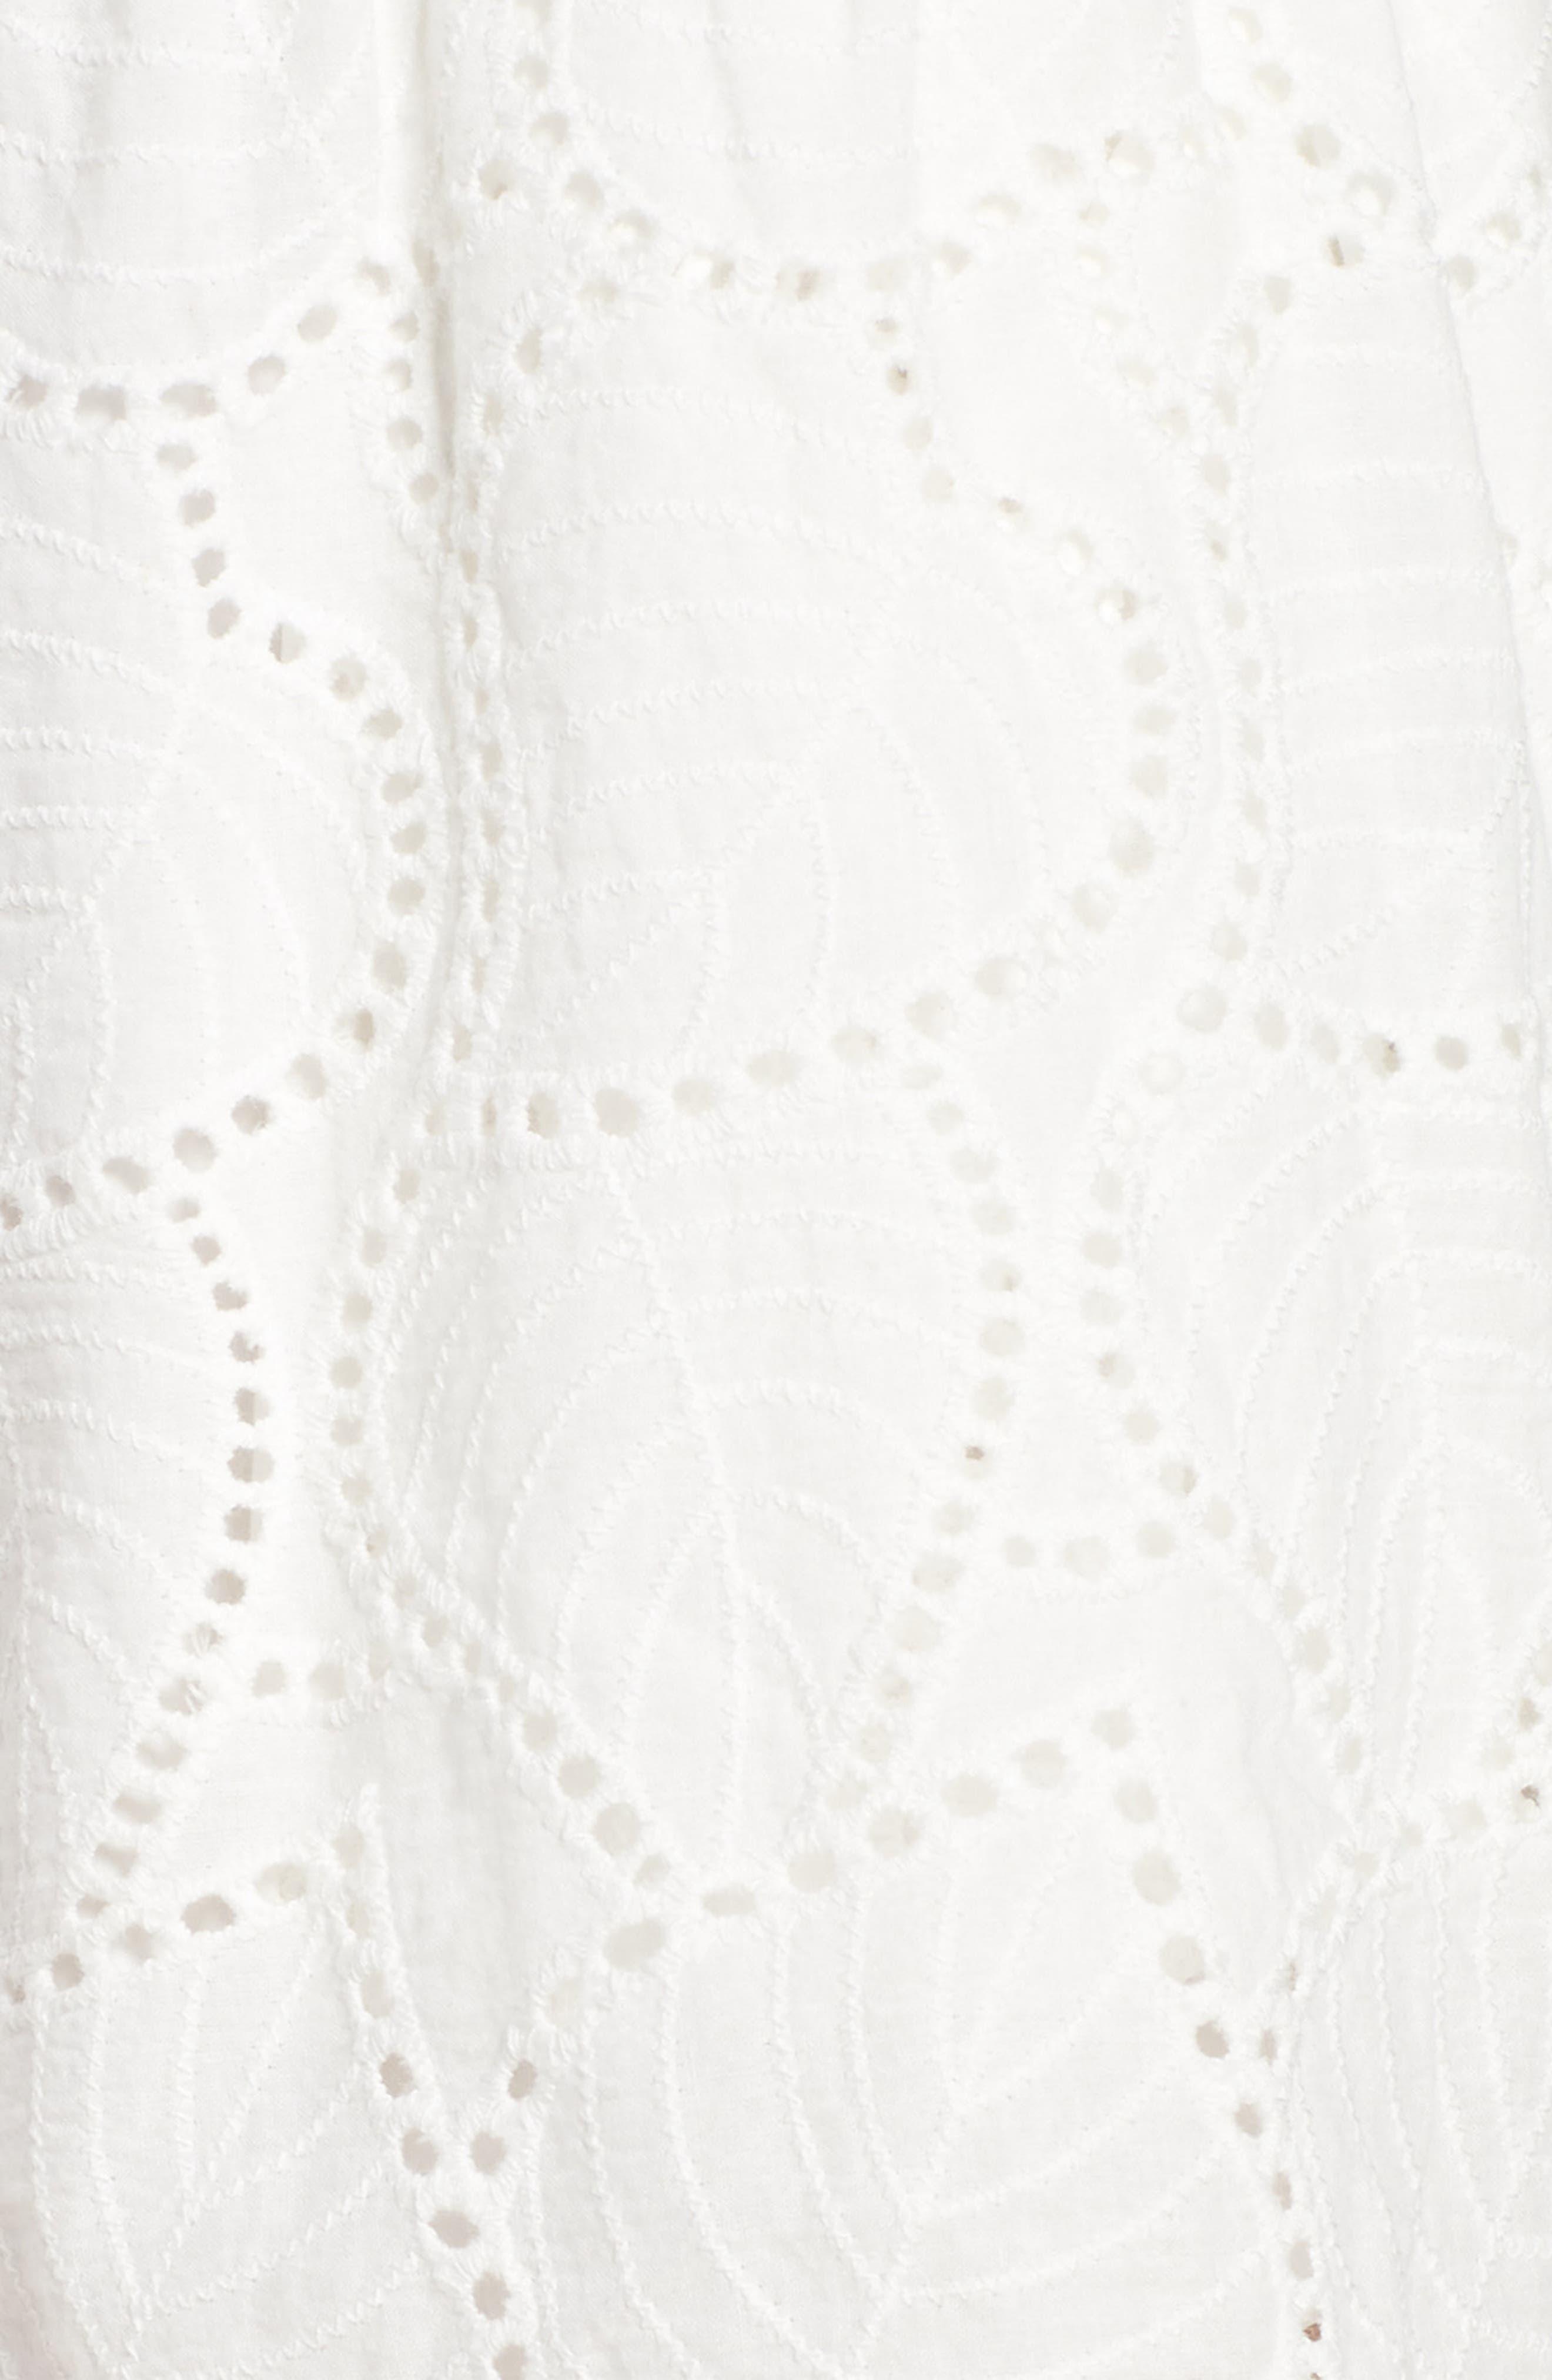 Bishop + Young Eyelet Shorts,                             Alternate thumbnail 5, color,                             White